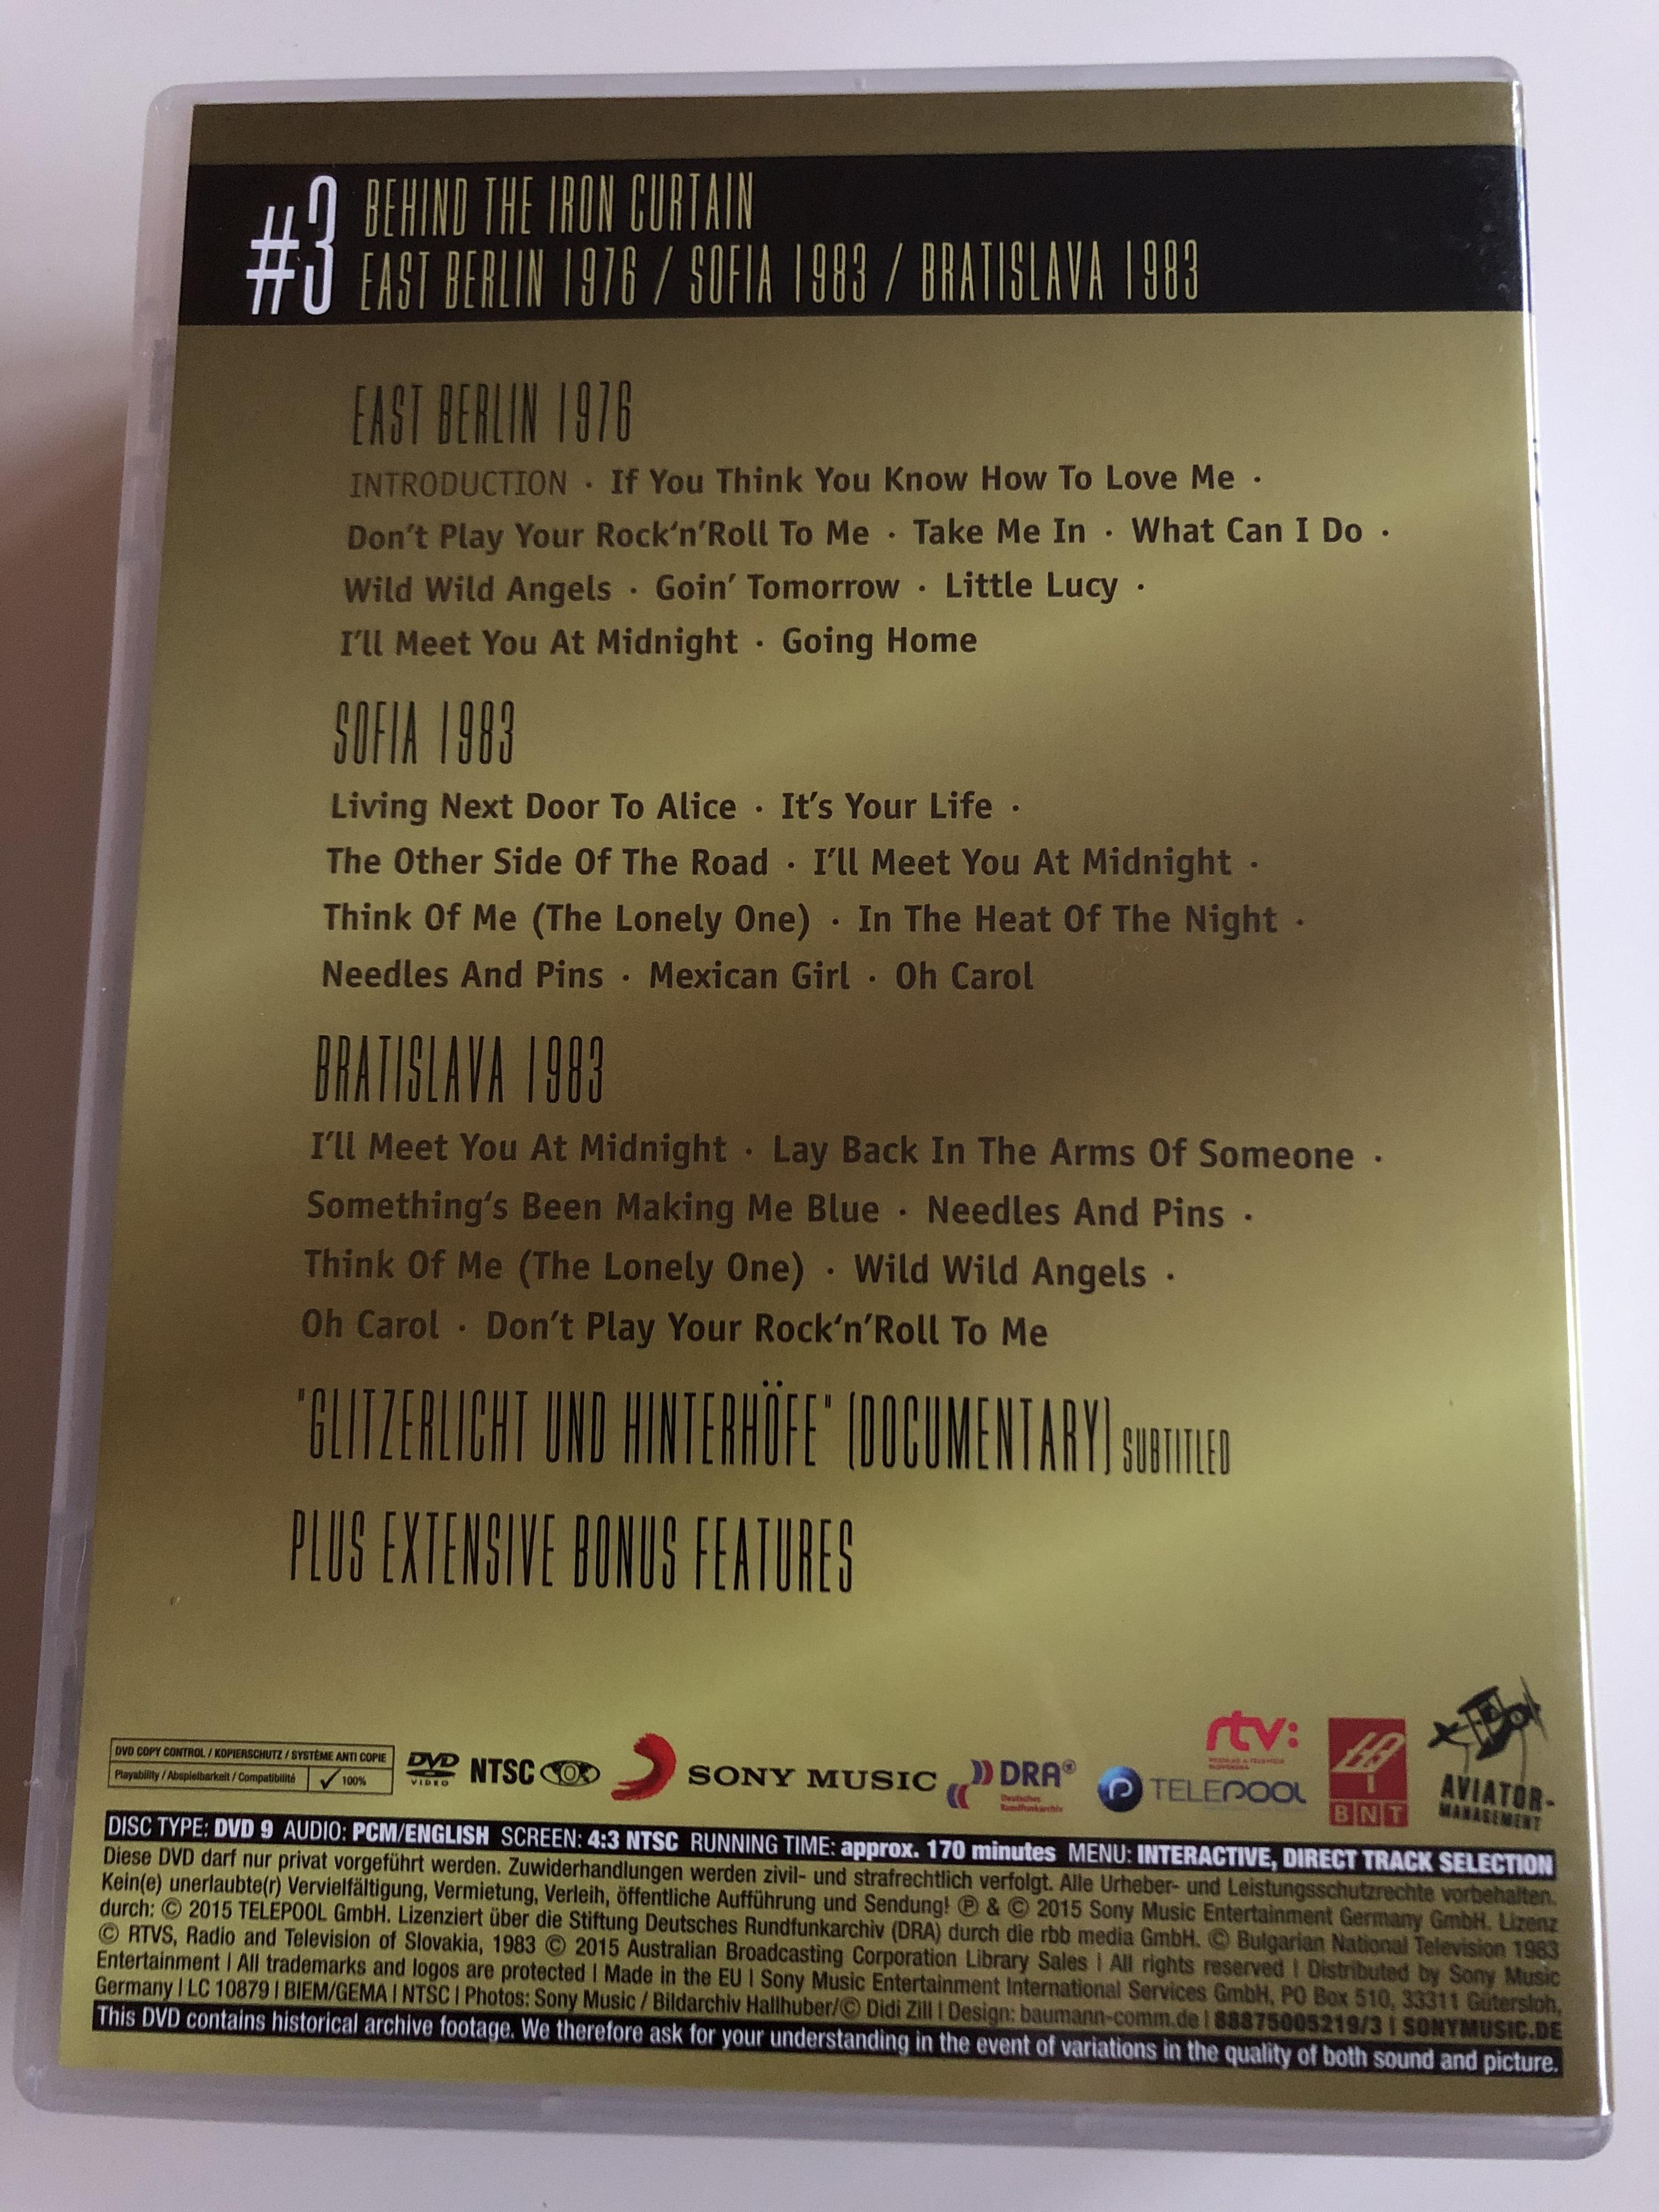 smokie-gold-1975-2015-dvd-3-40th-anniversary-edition-behind-the-iron-curtain-east-berlin-1976-sofia-1983-bratislava-1983-glitzerlicht-und-hinterh-fe-documentary-sony-music-2-.jpg